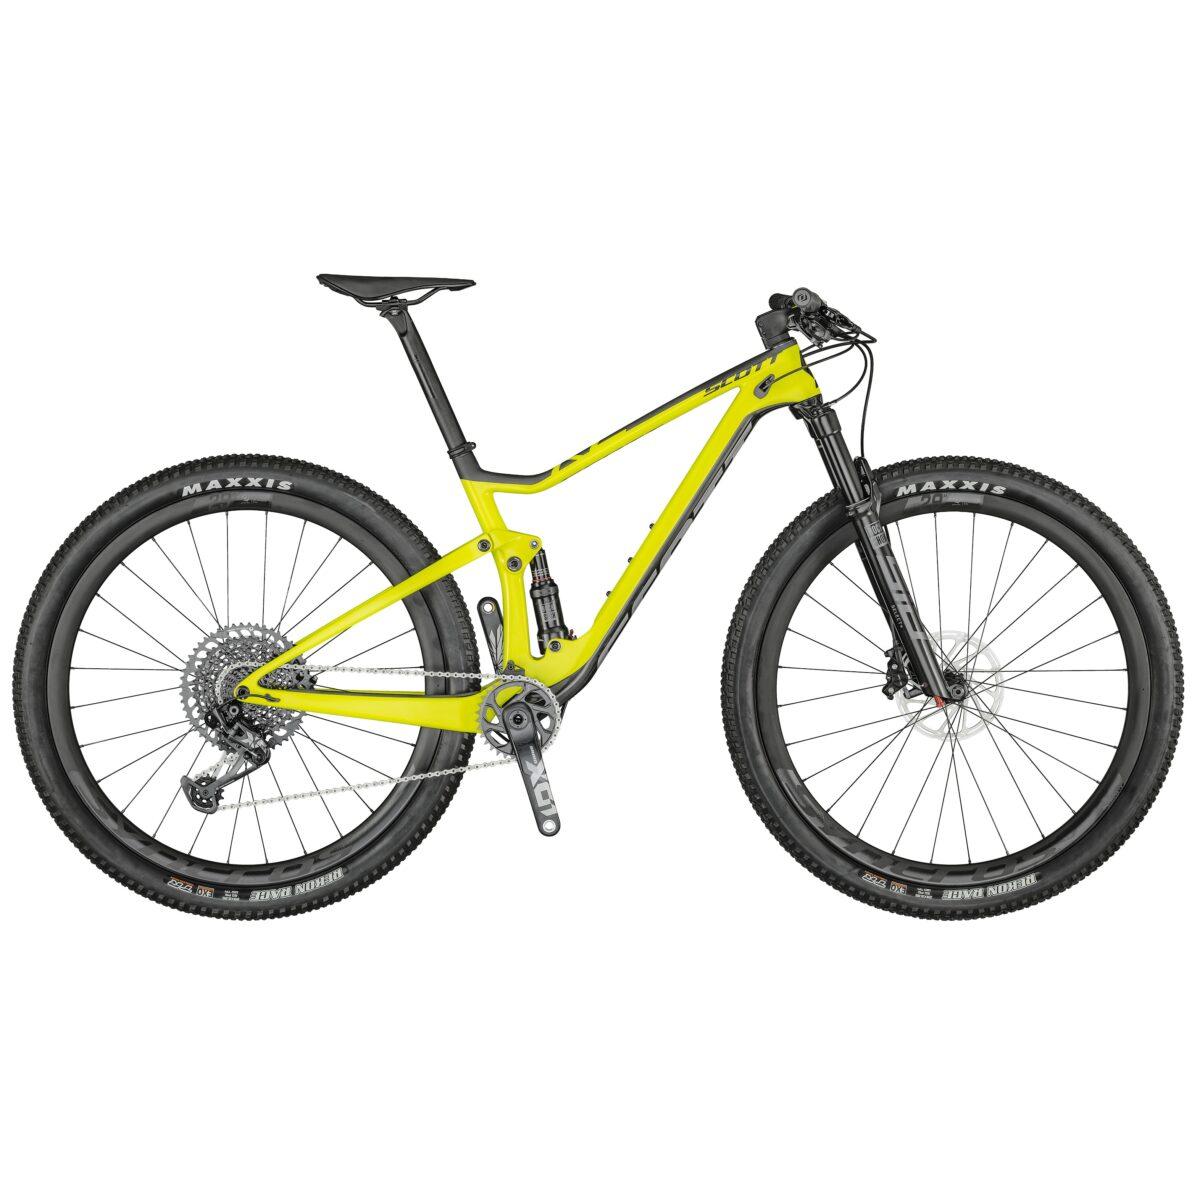 BICICLETA-SCOTT-SPARK-RC900-WC color YELLOW